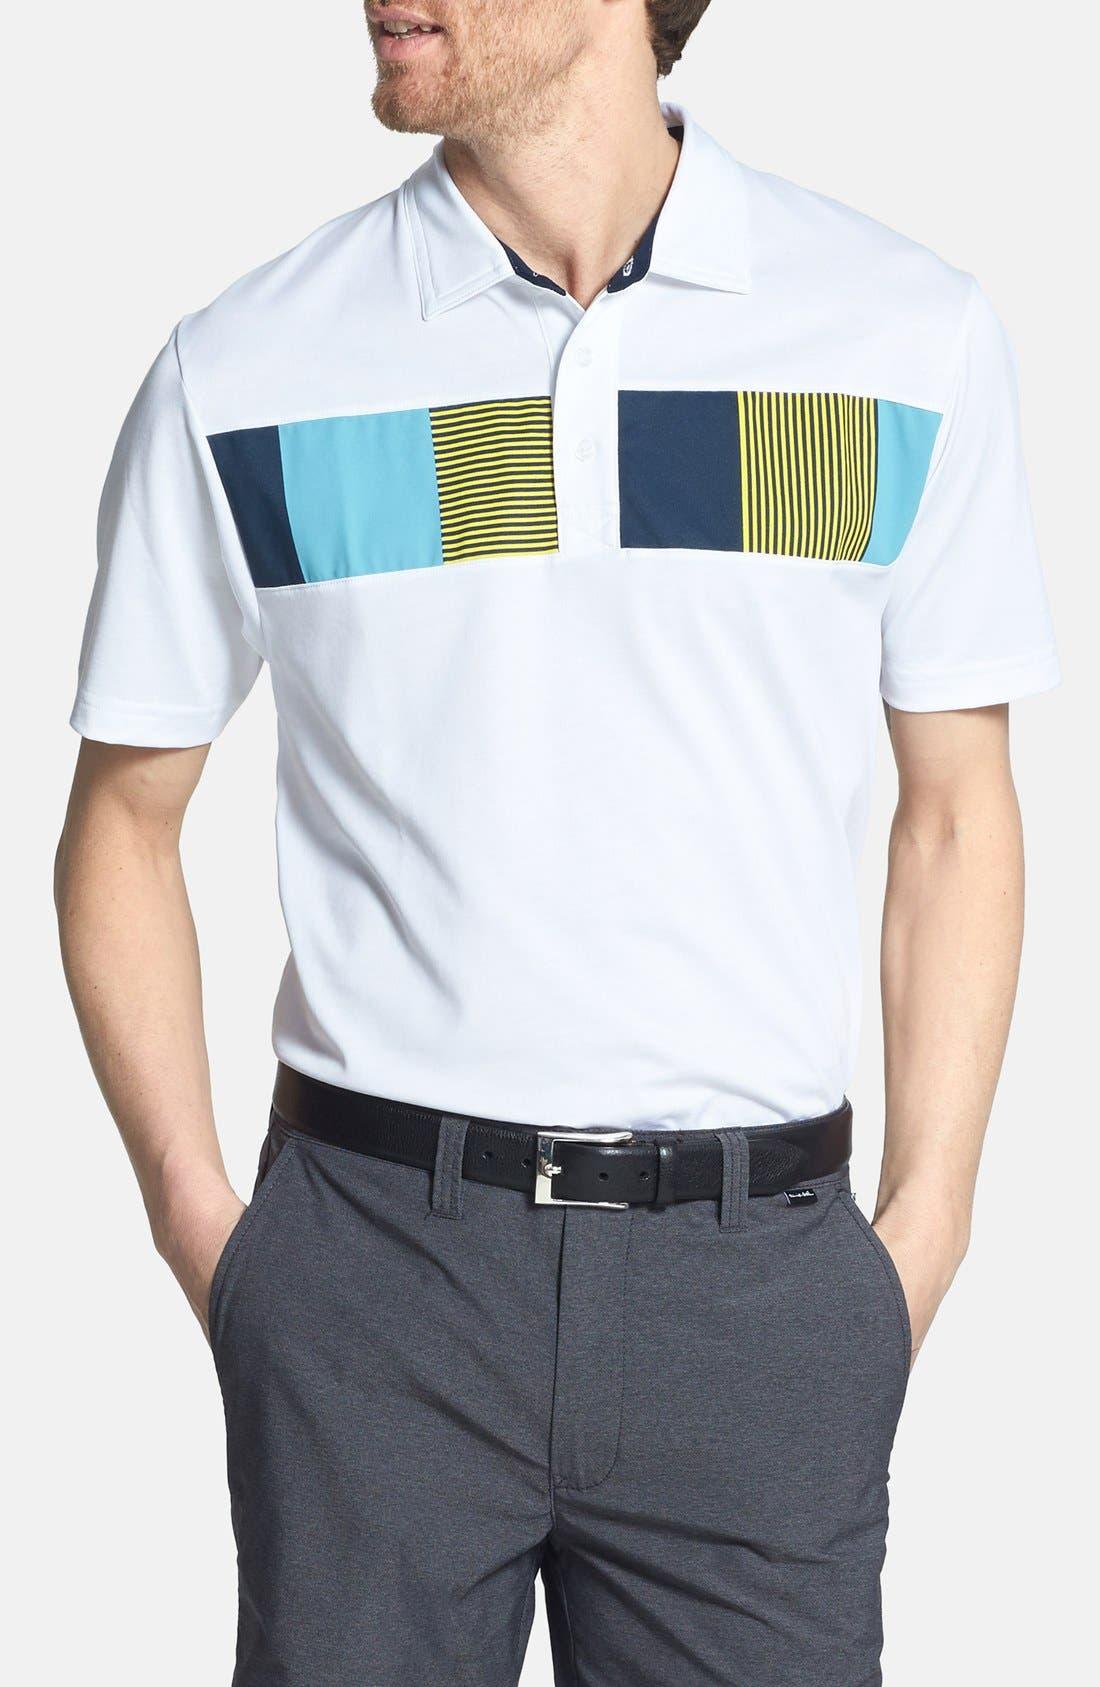 Alternate Image 1 Selected - Travis Mathew 'Ambrosio' Trim Fit Golf Polo